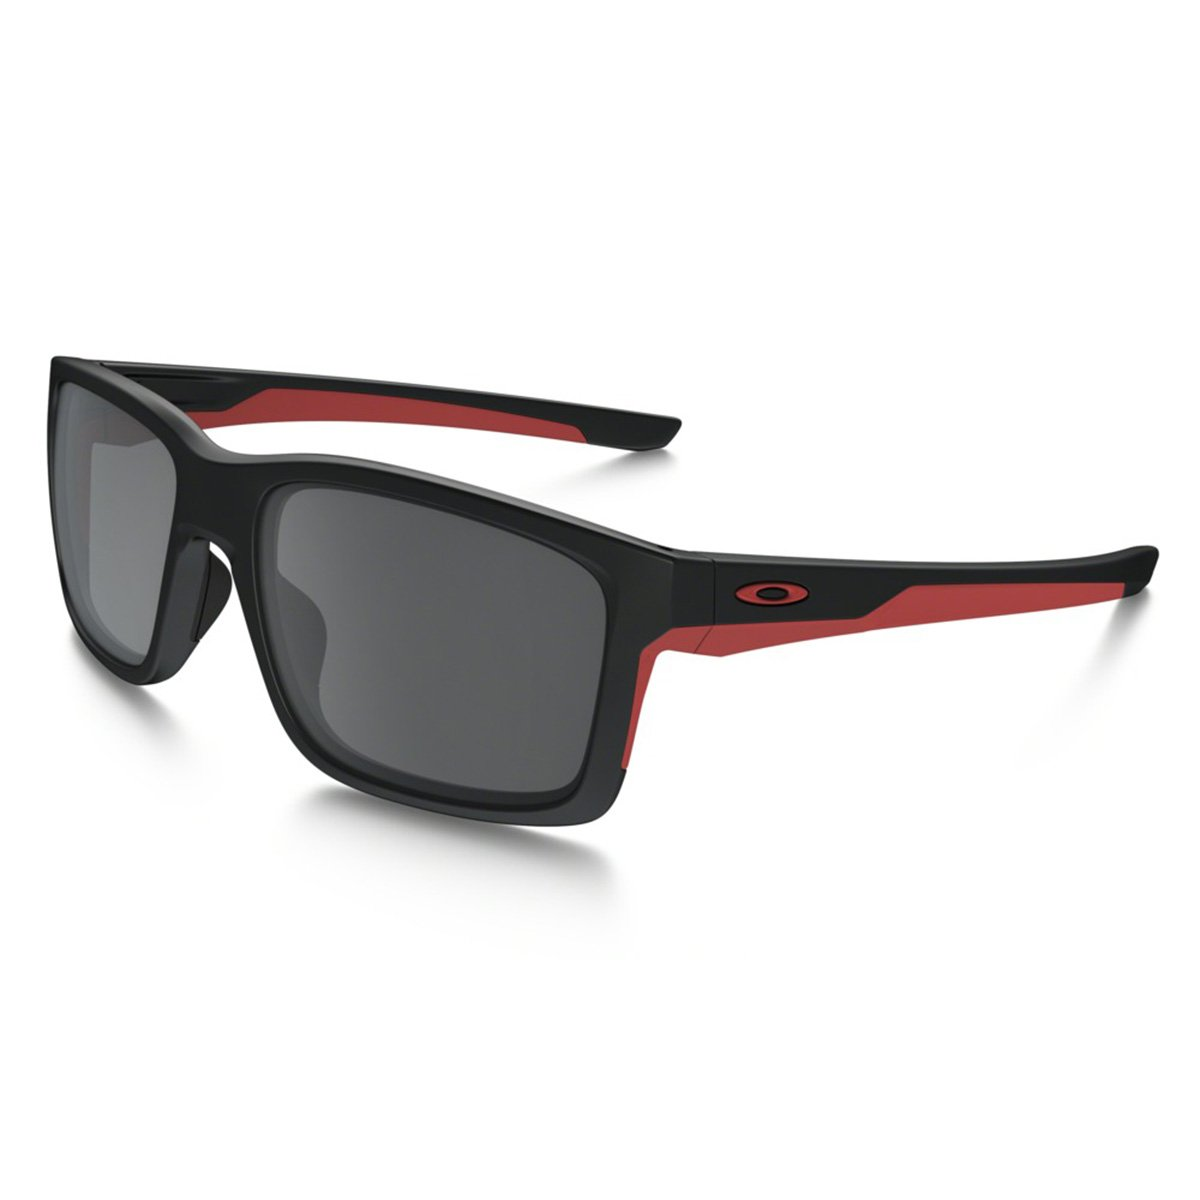 Oakley Men's Mainlink Non-Polarized Iridium Rectangular Sunglasses, MATTE BLACK, 57.01 mm